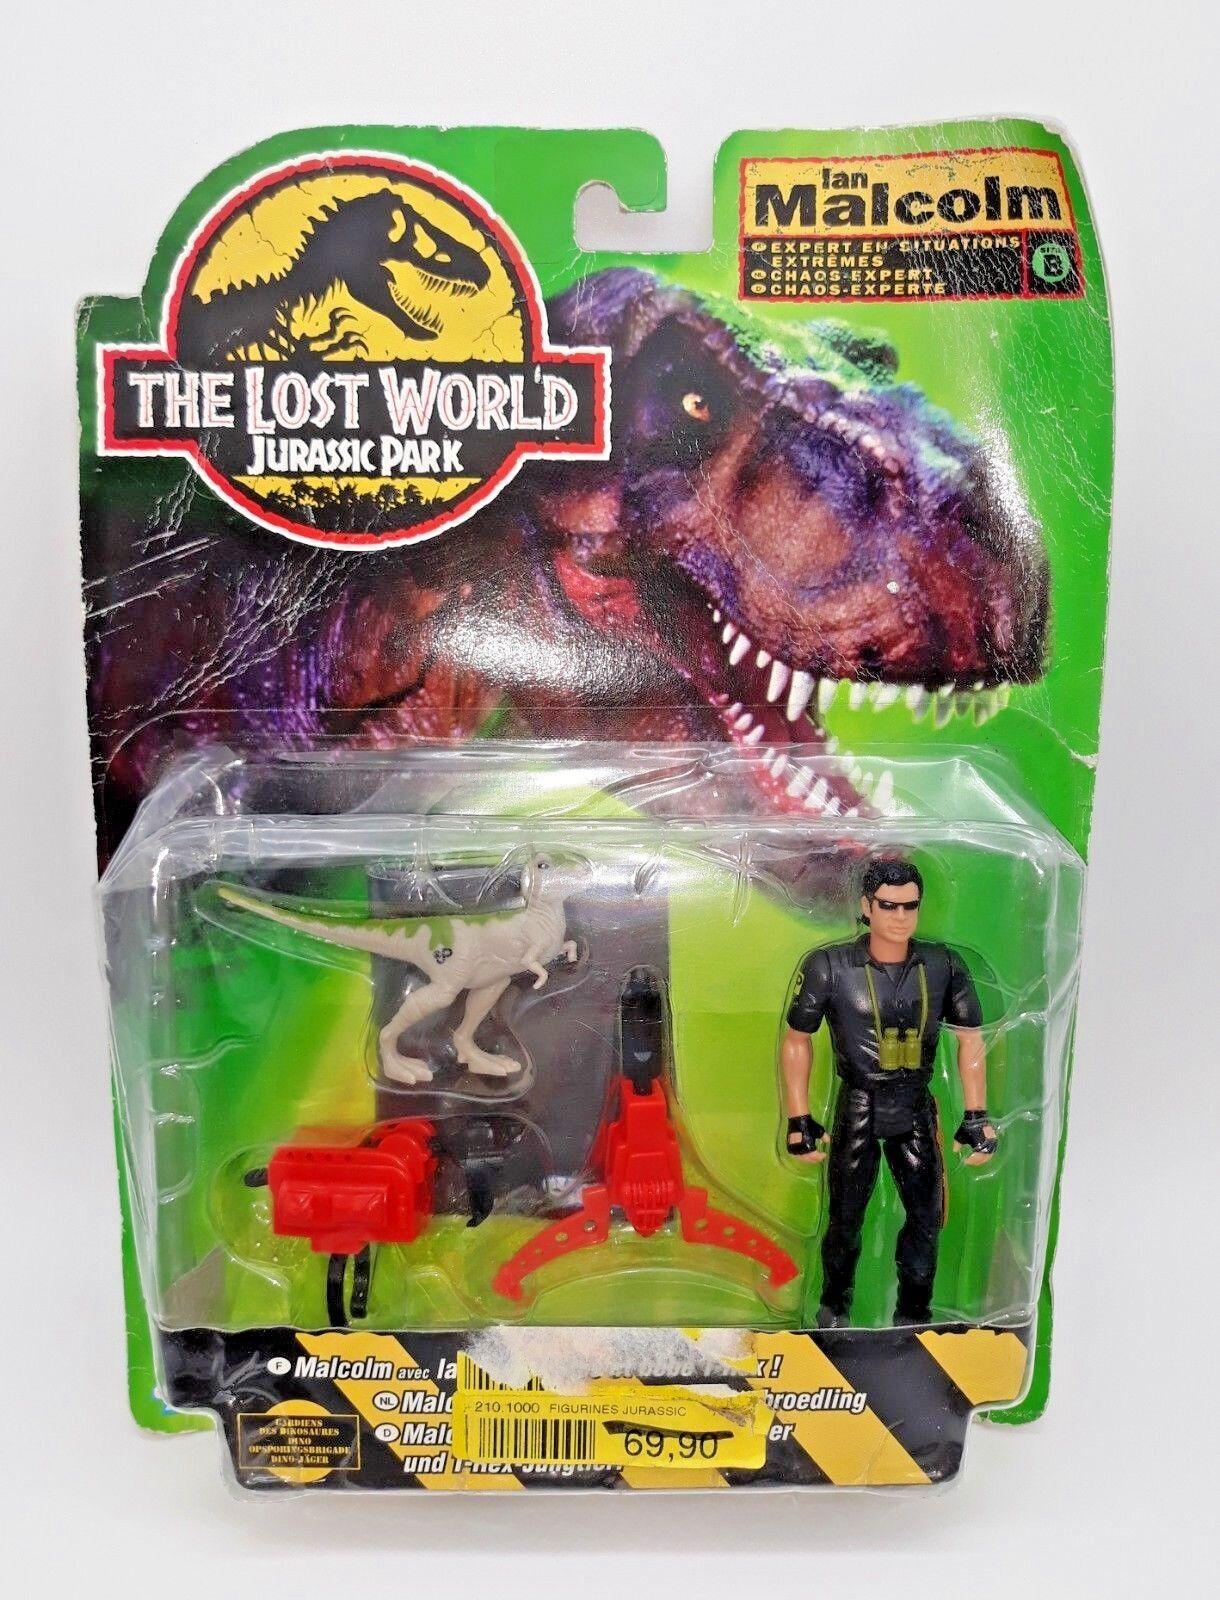 Jurassic park der verlorenen welt komplett ian malcolm moc versiegelt neue tri - logo, 1996